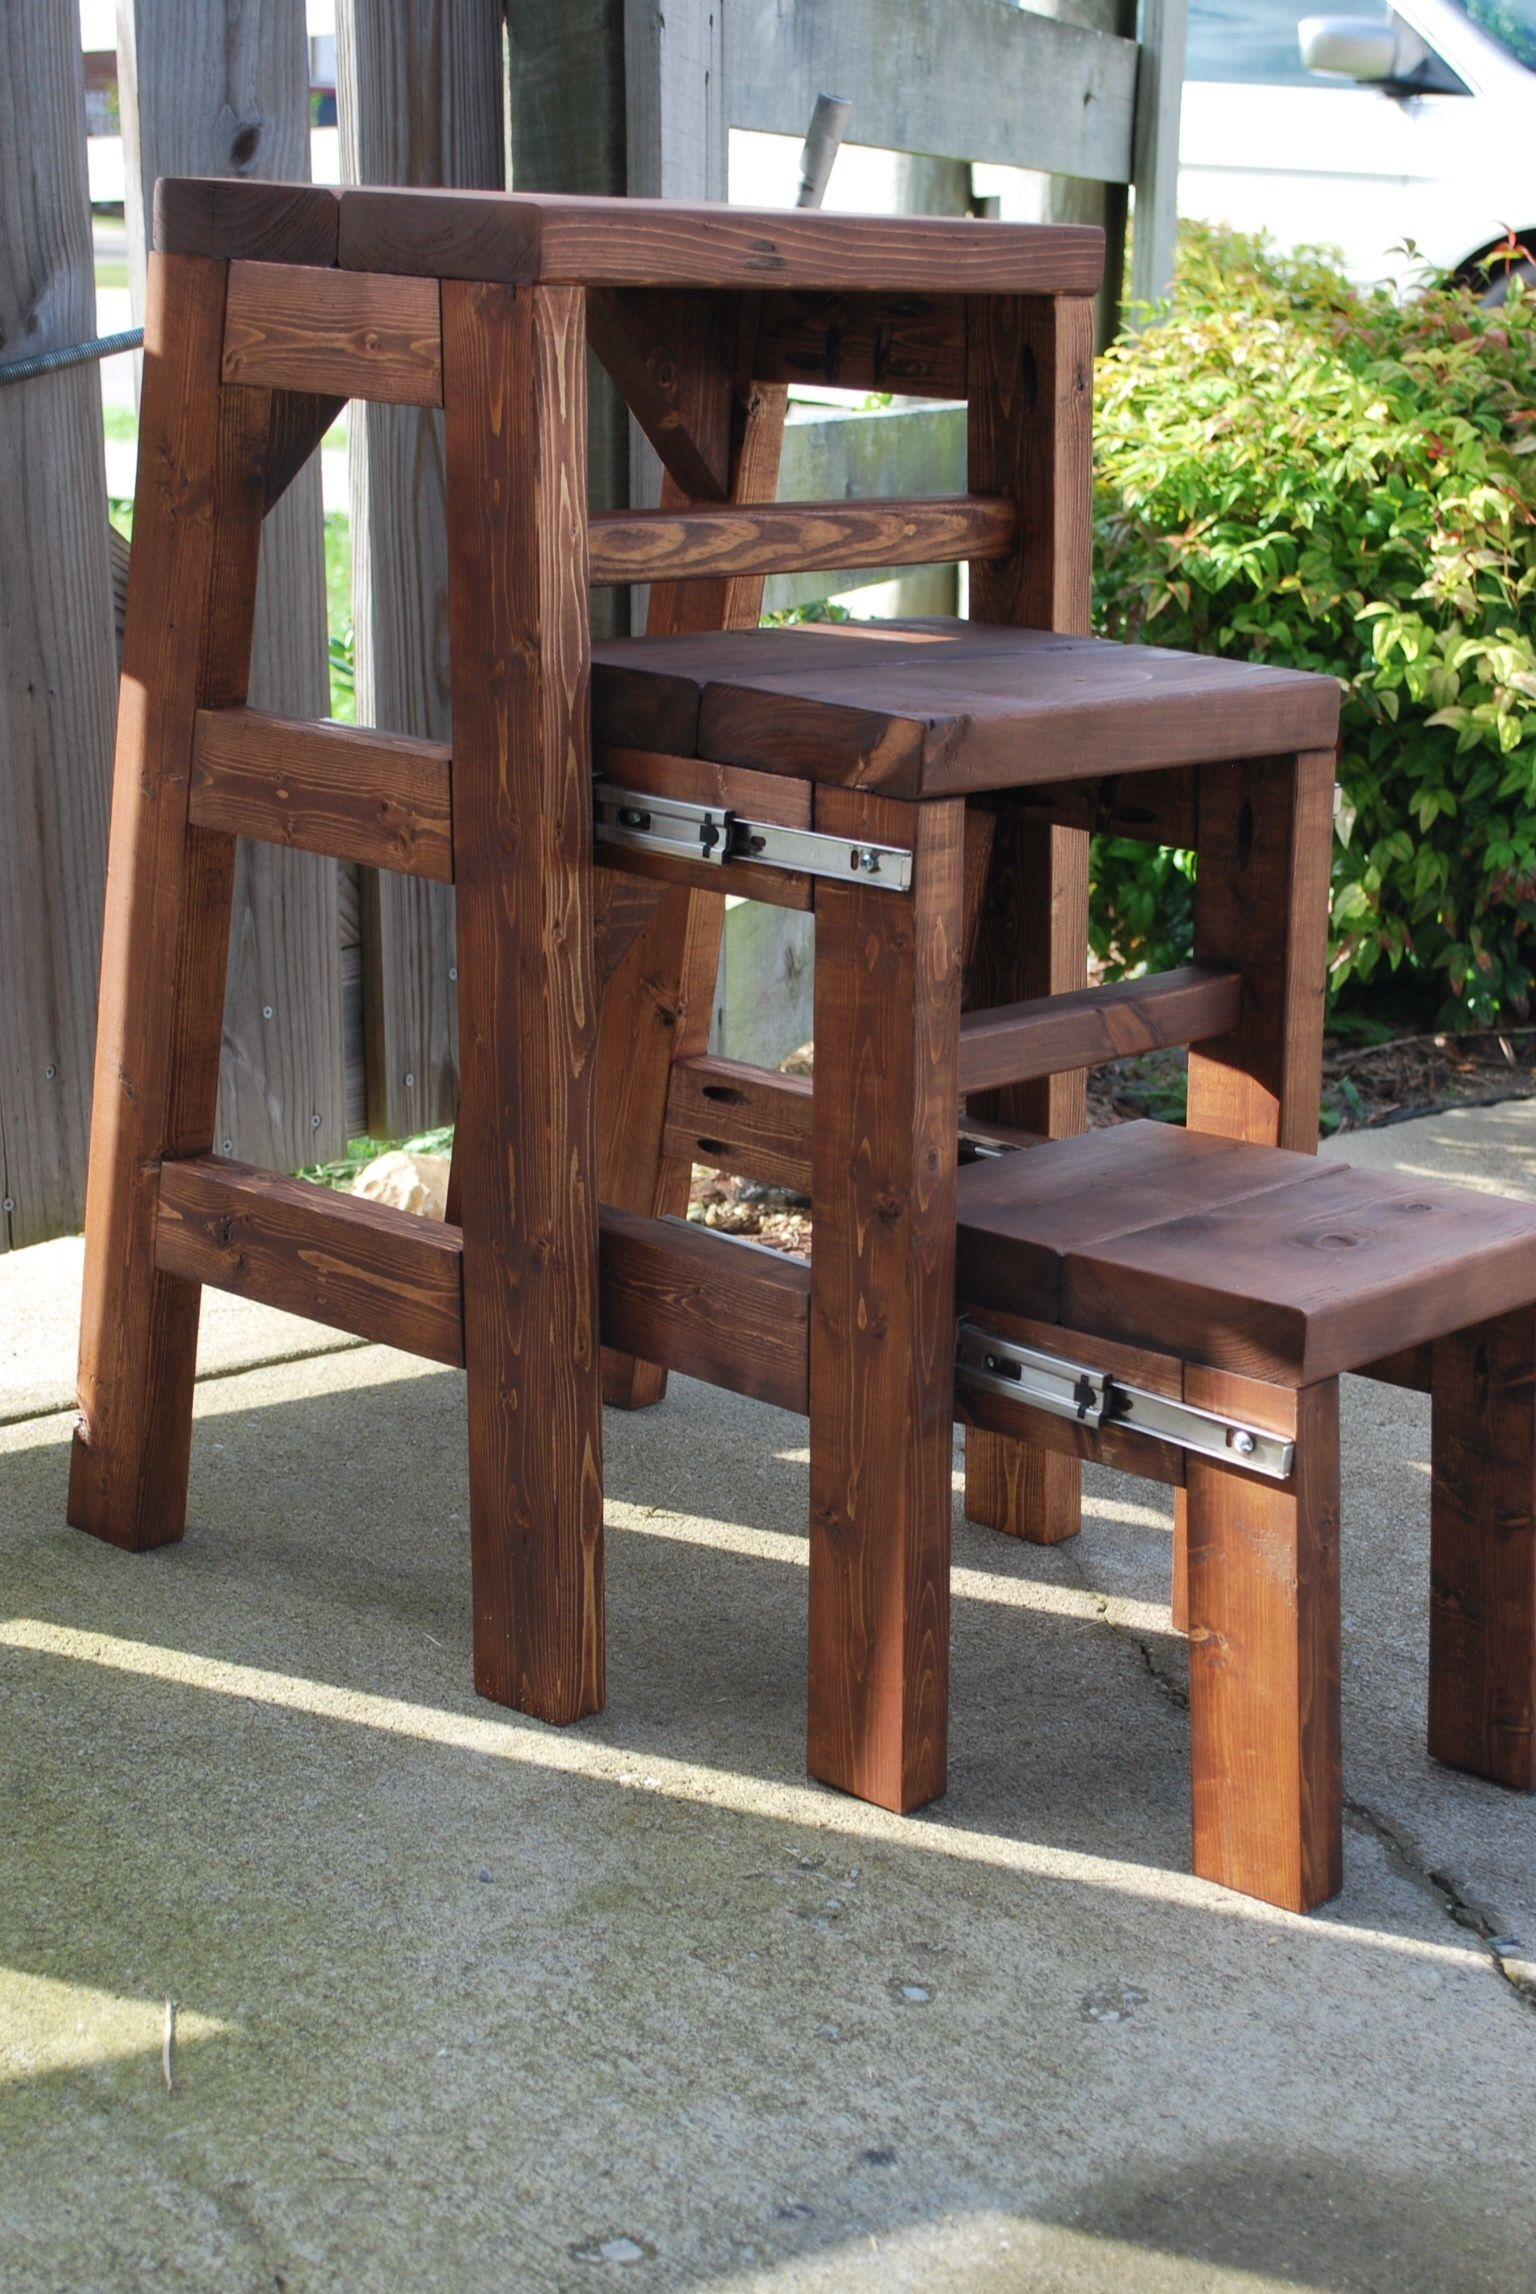 yellow flower step stool kids step stool hand painted step stool oval step stool